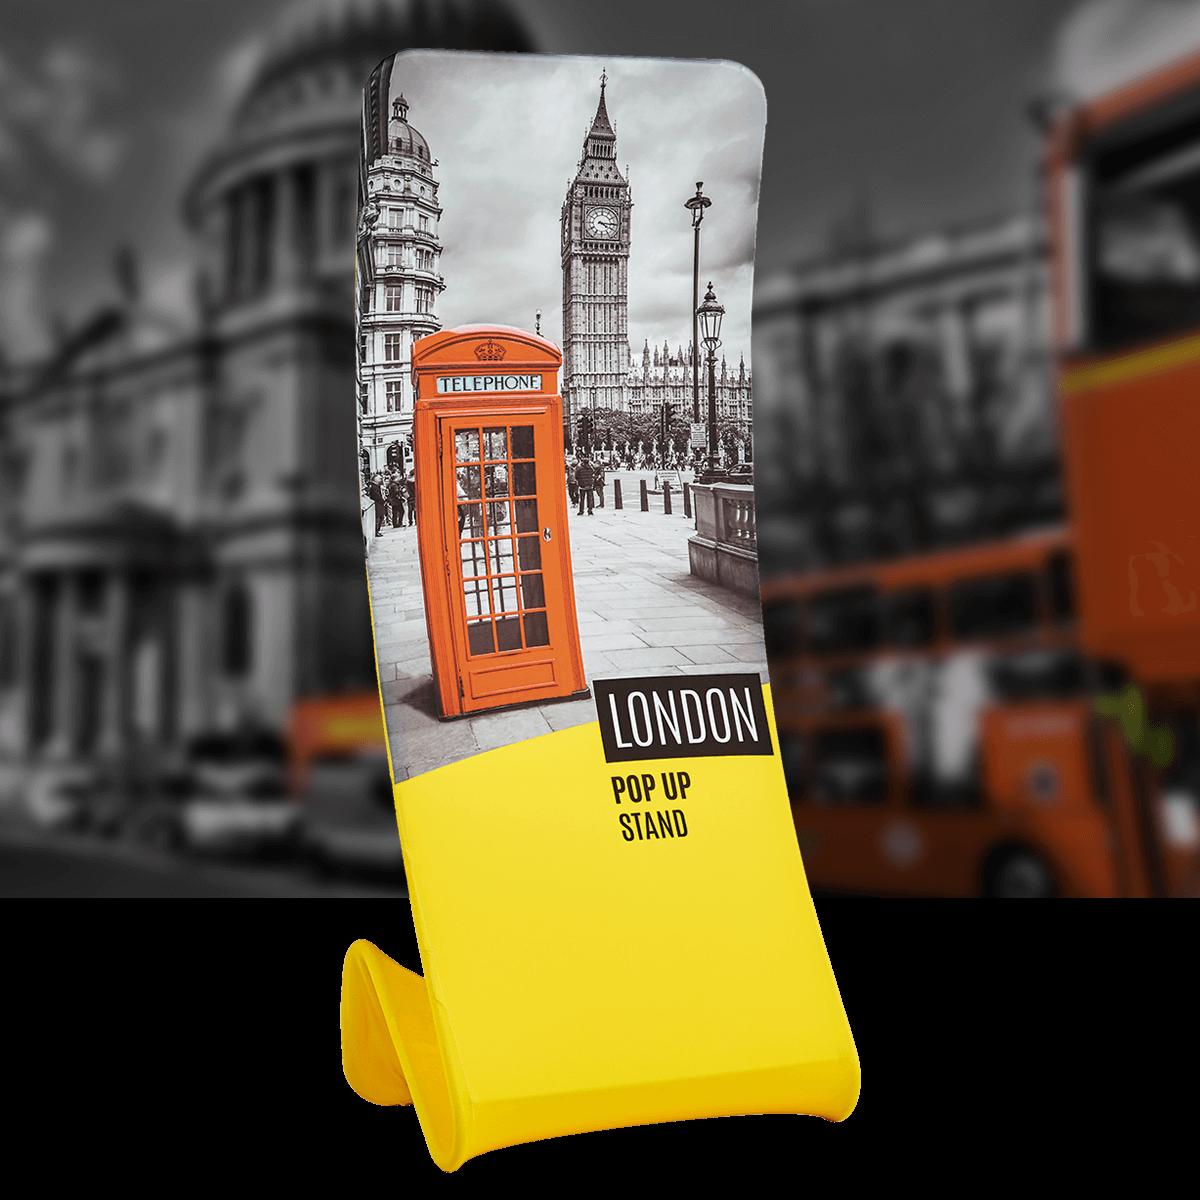 London Product Image